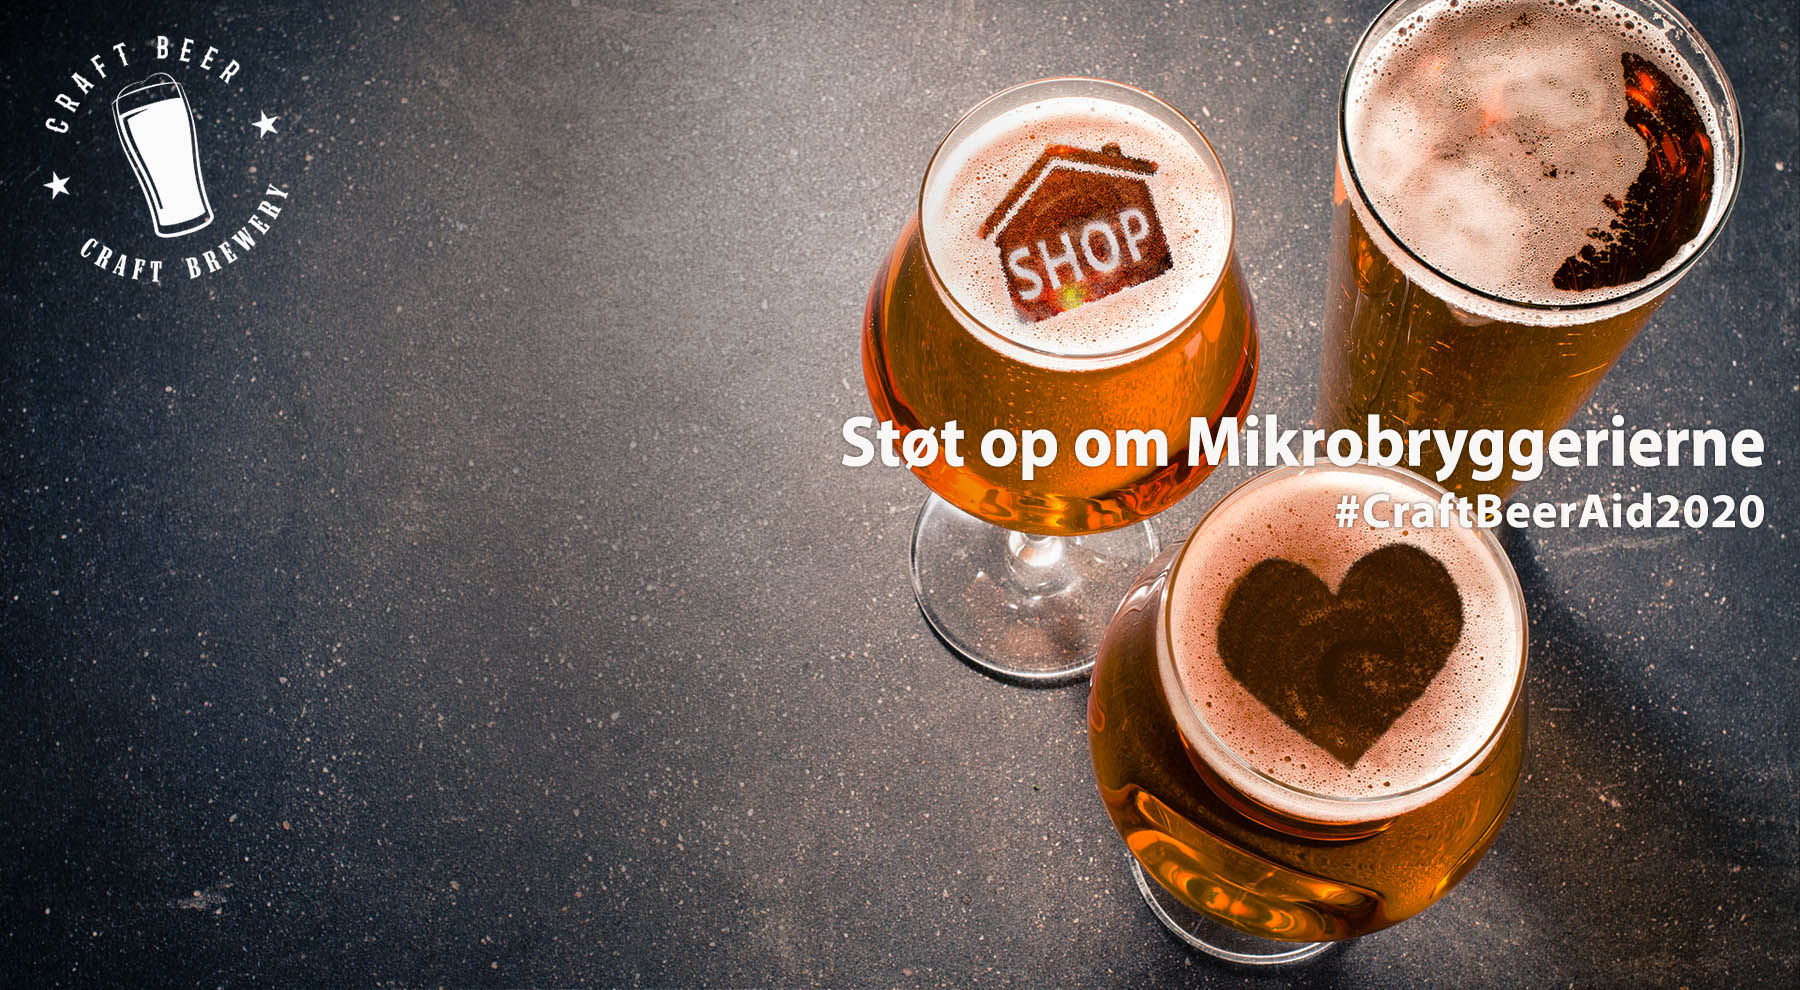 Støt op om Mikrobryggerierne